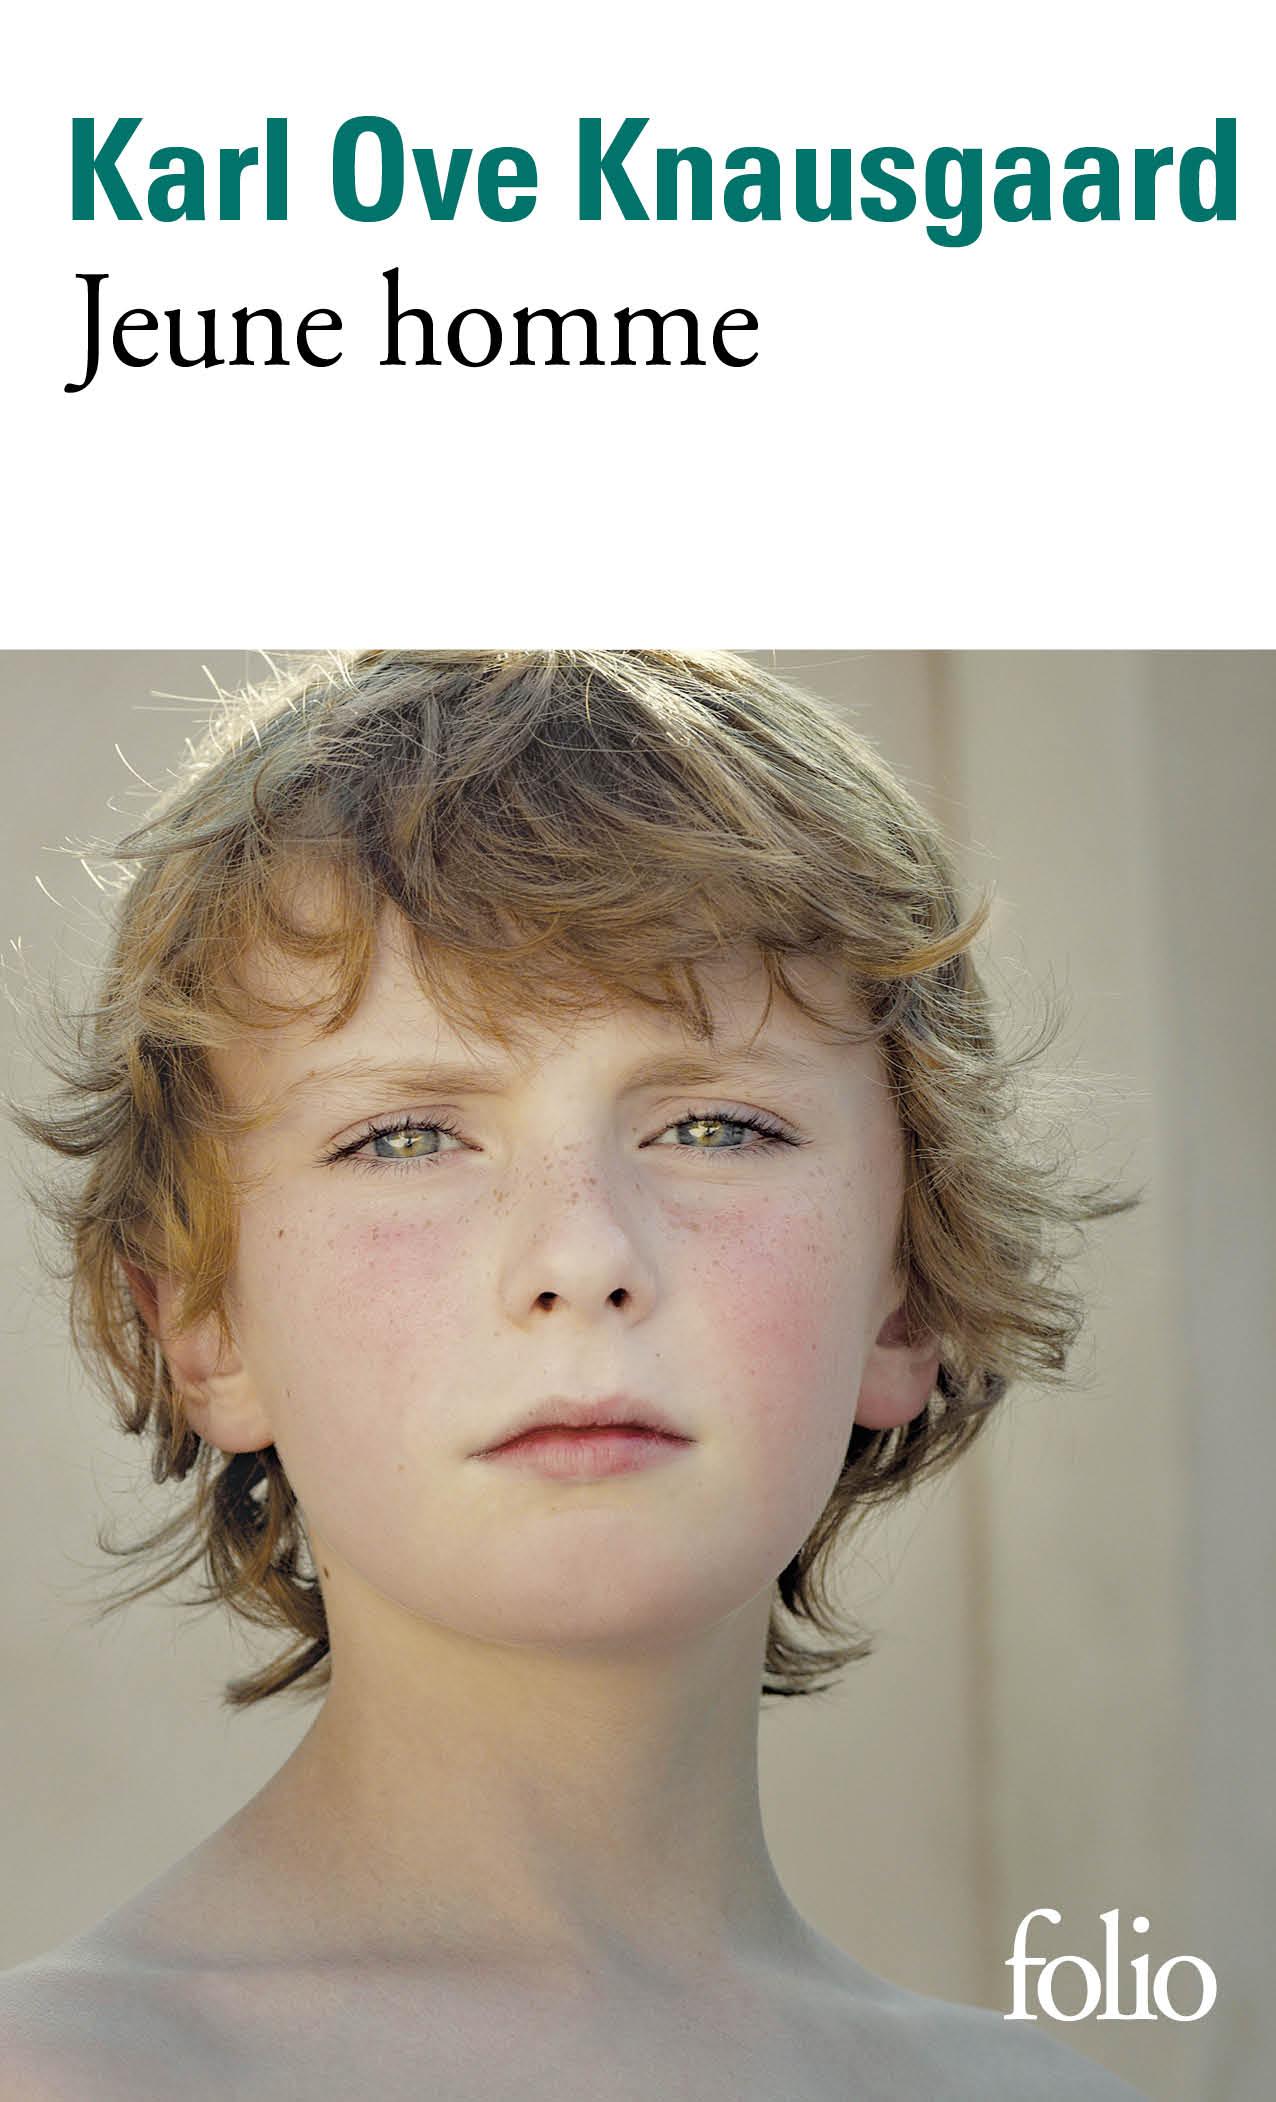 Mon combat (Tome 3) - Jeune homme |